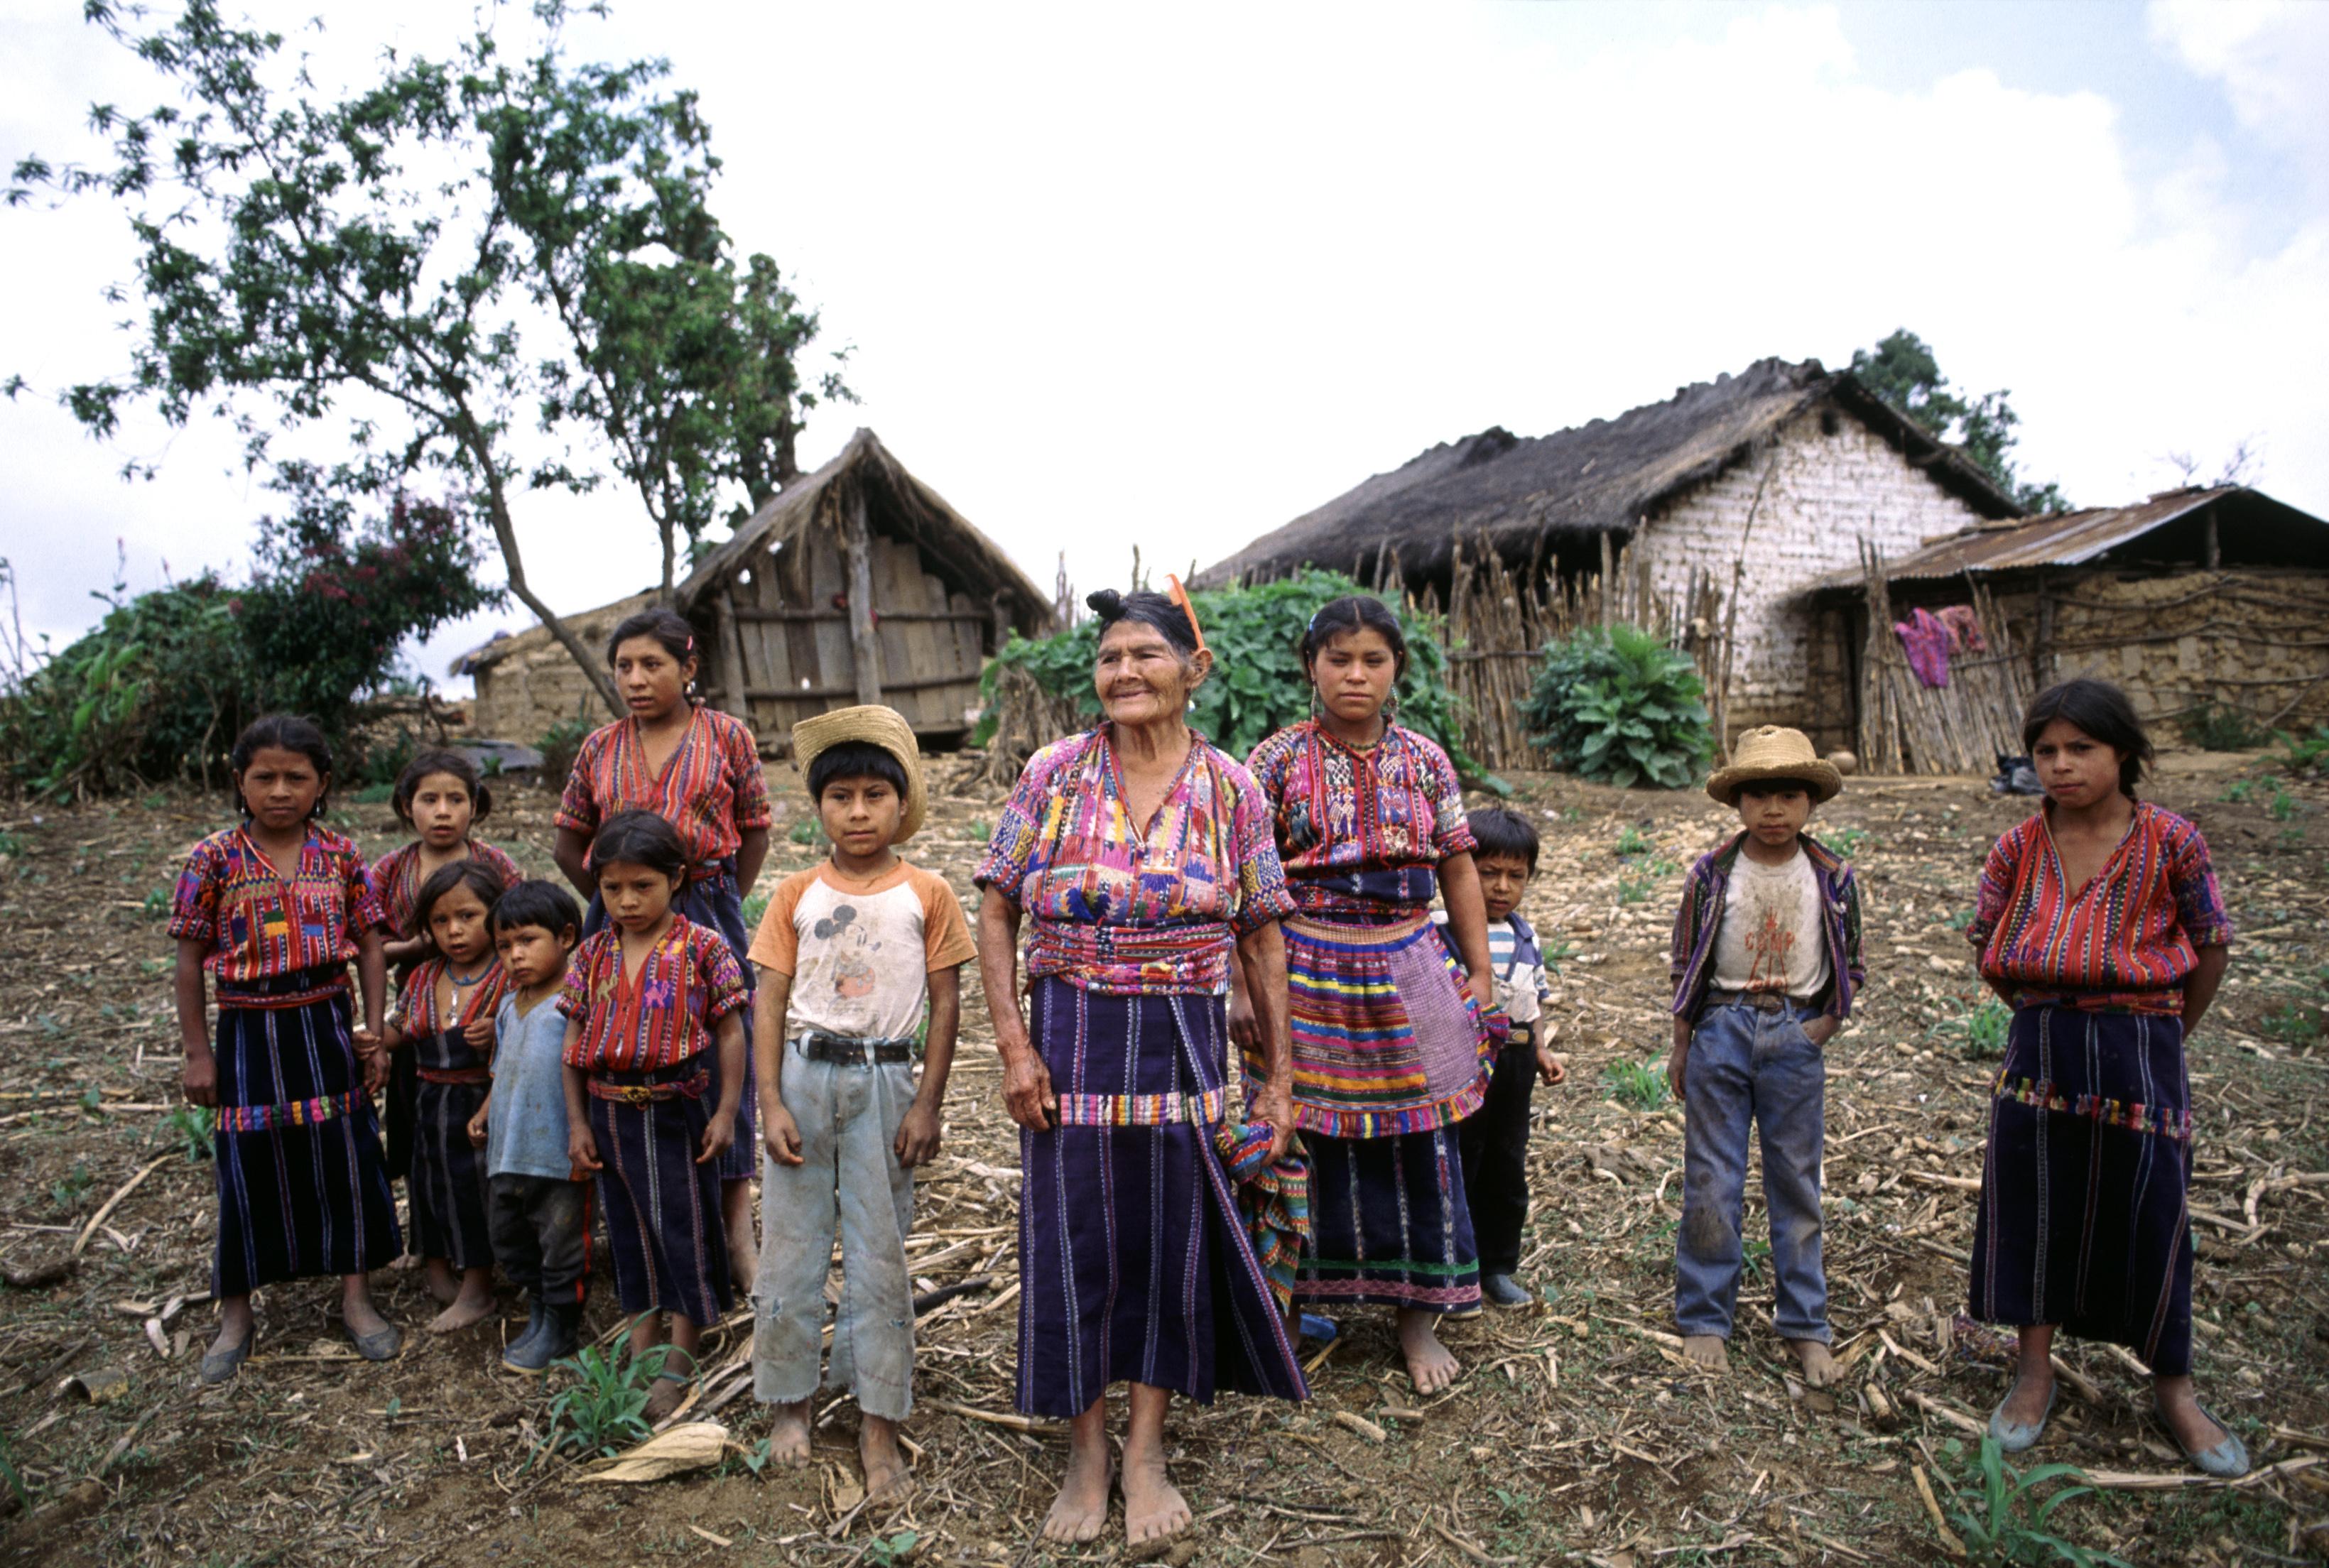 Kaqchikel family